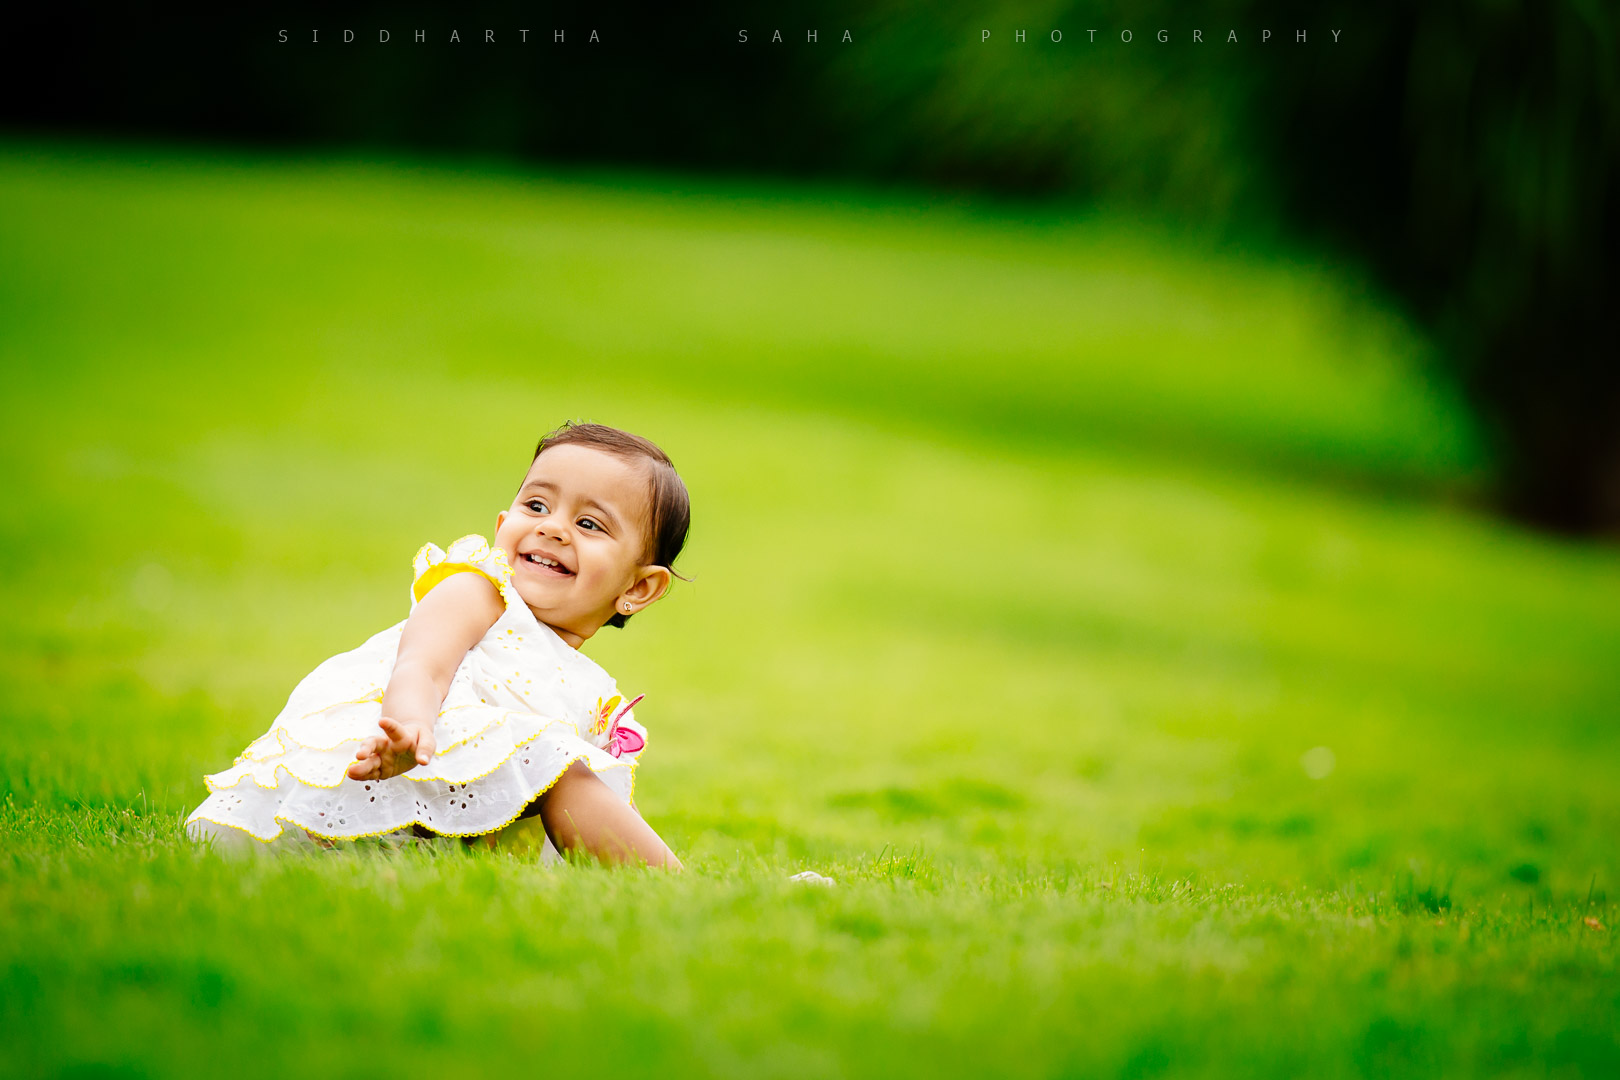 2015-08-08 - Padmaja Ketan Family Photoshoot - _05Y7983